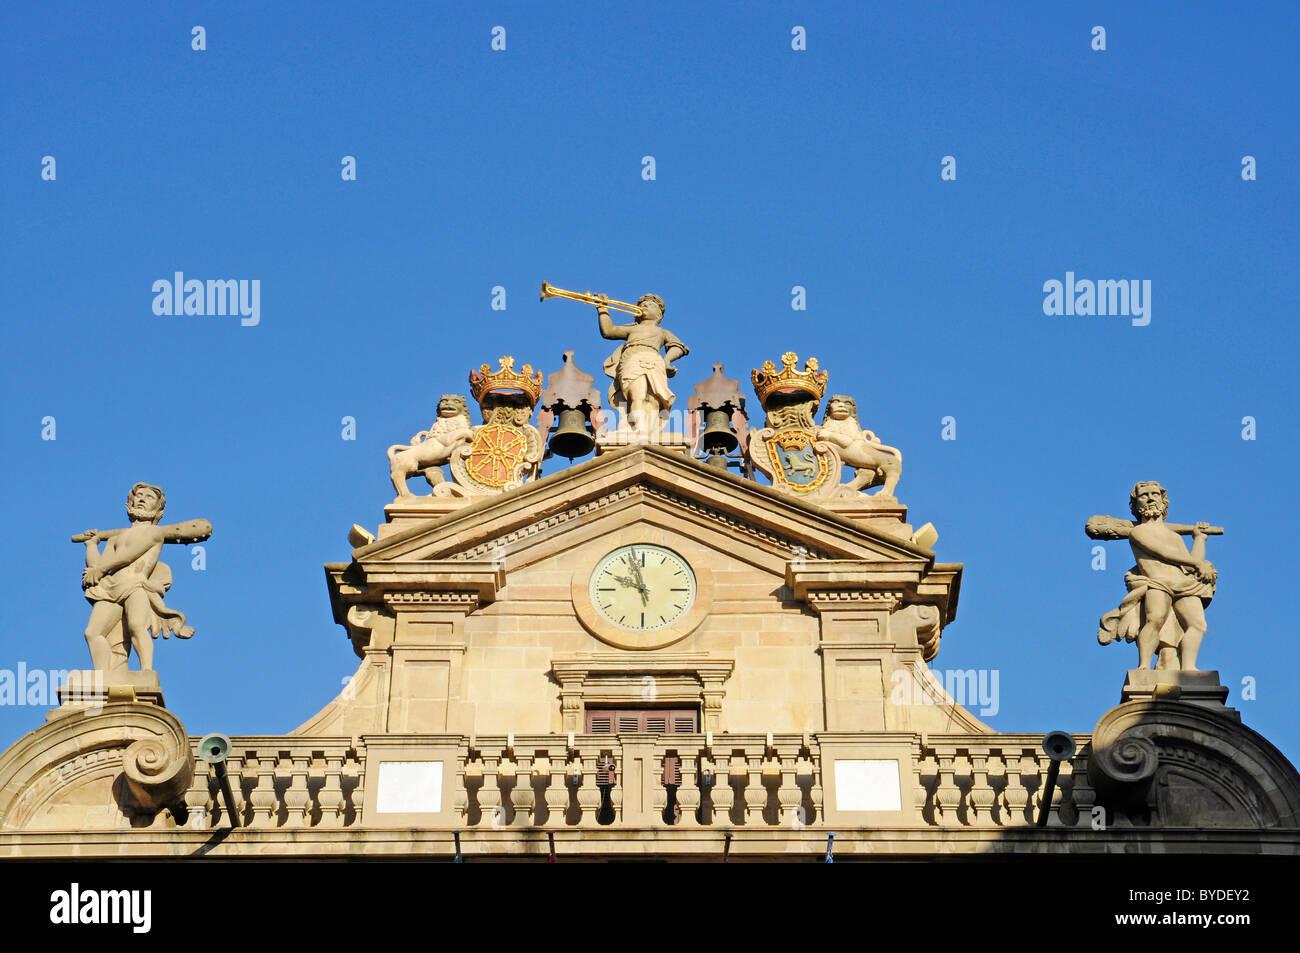 Figures, historic building, facade, Pamplona, Navarra, Spain, Europe - Stock Image